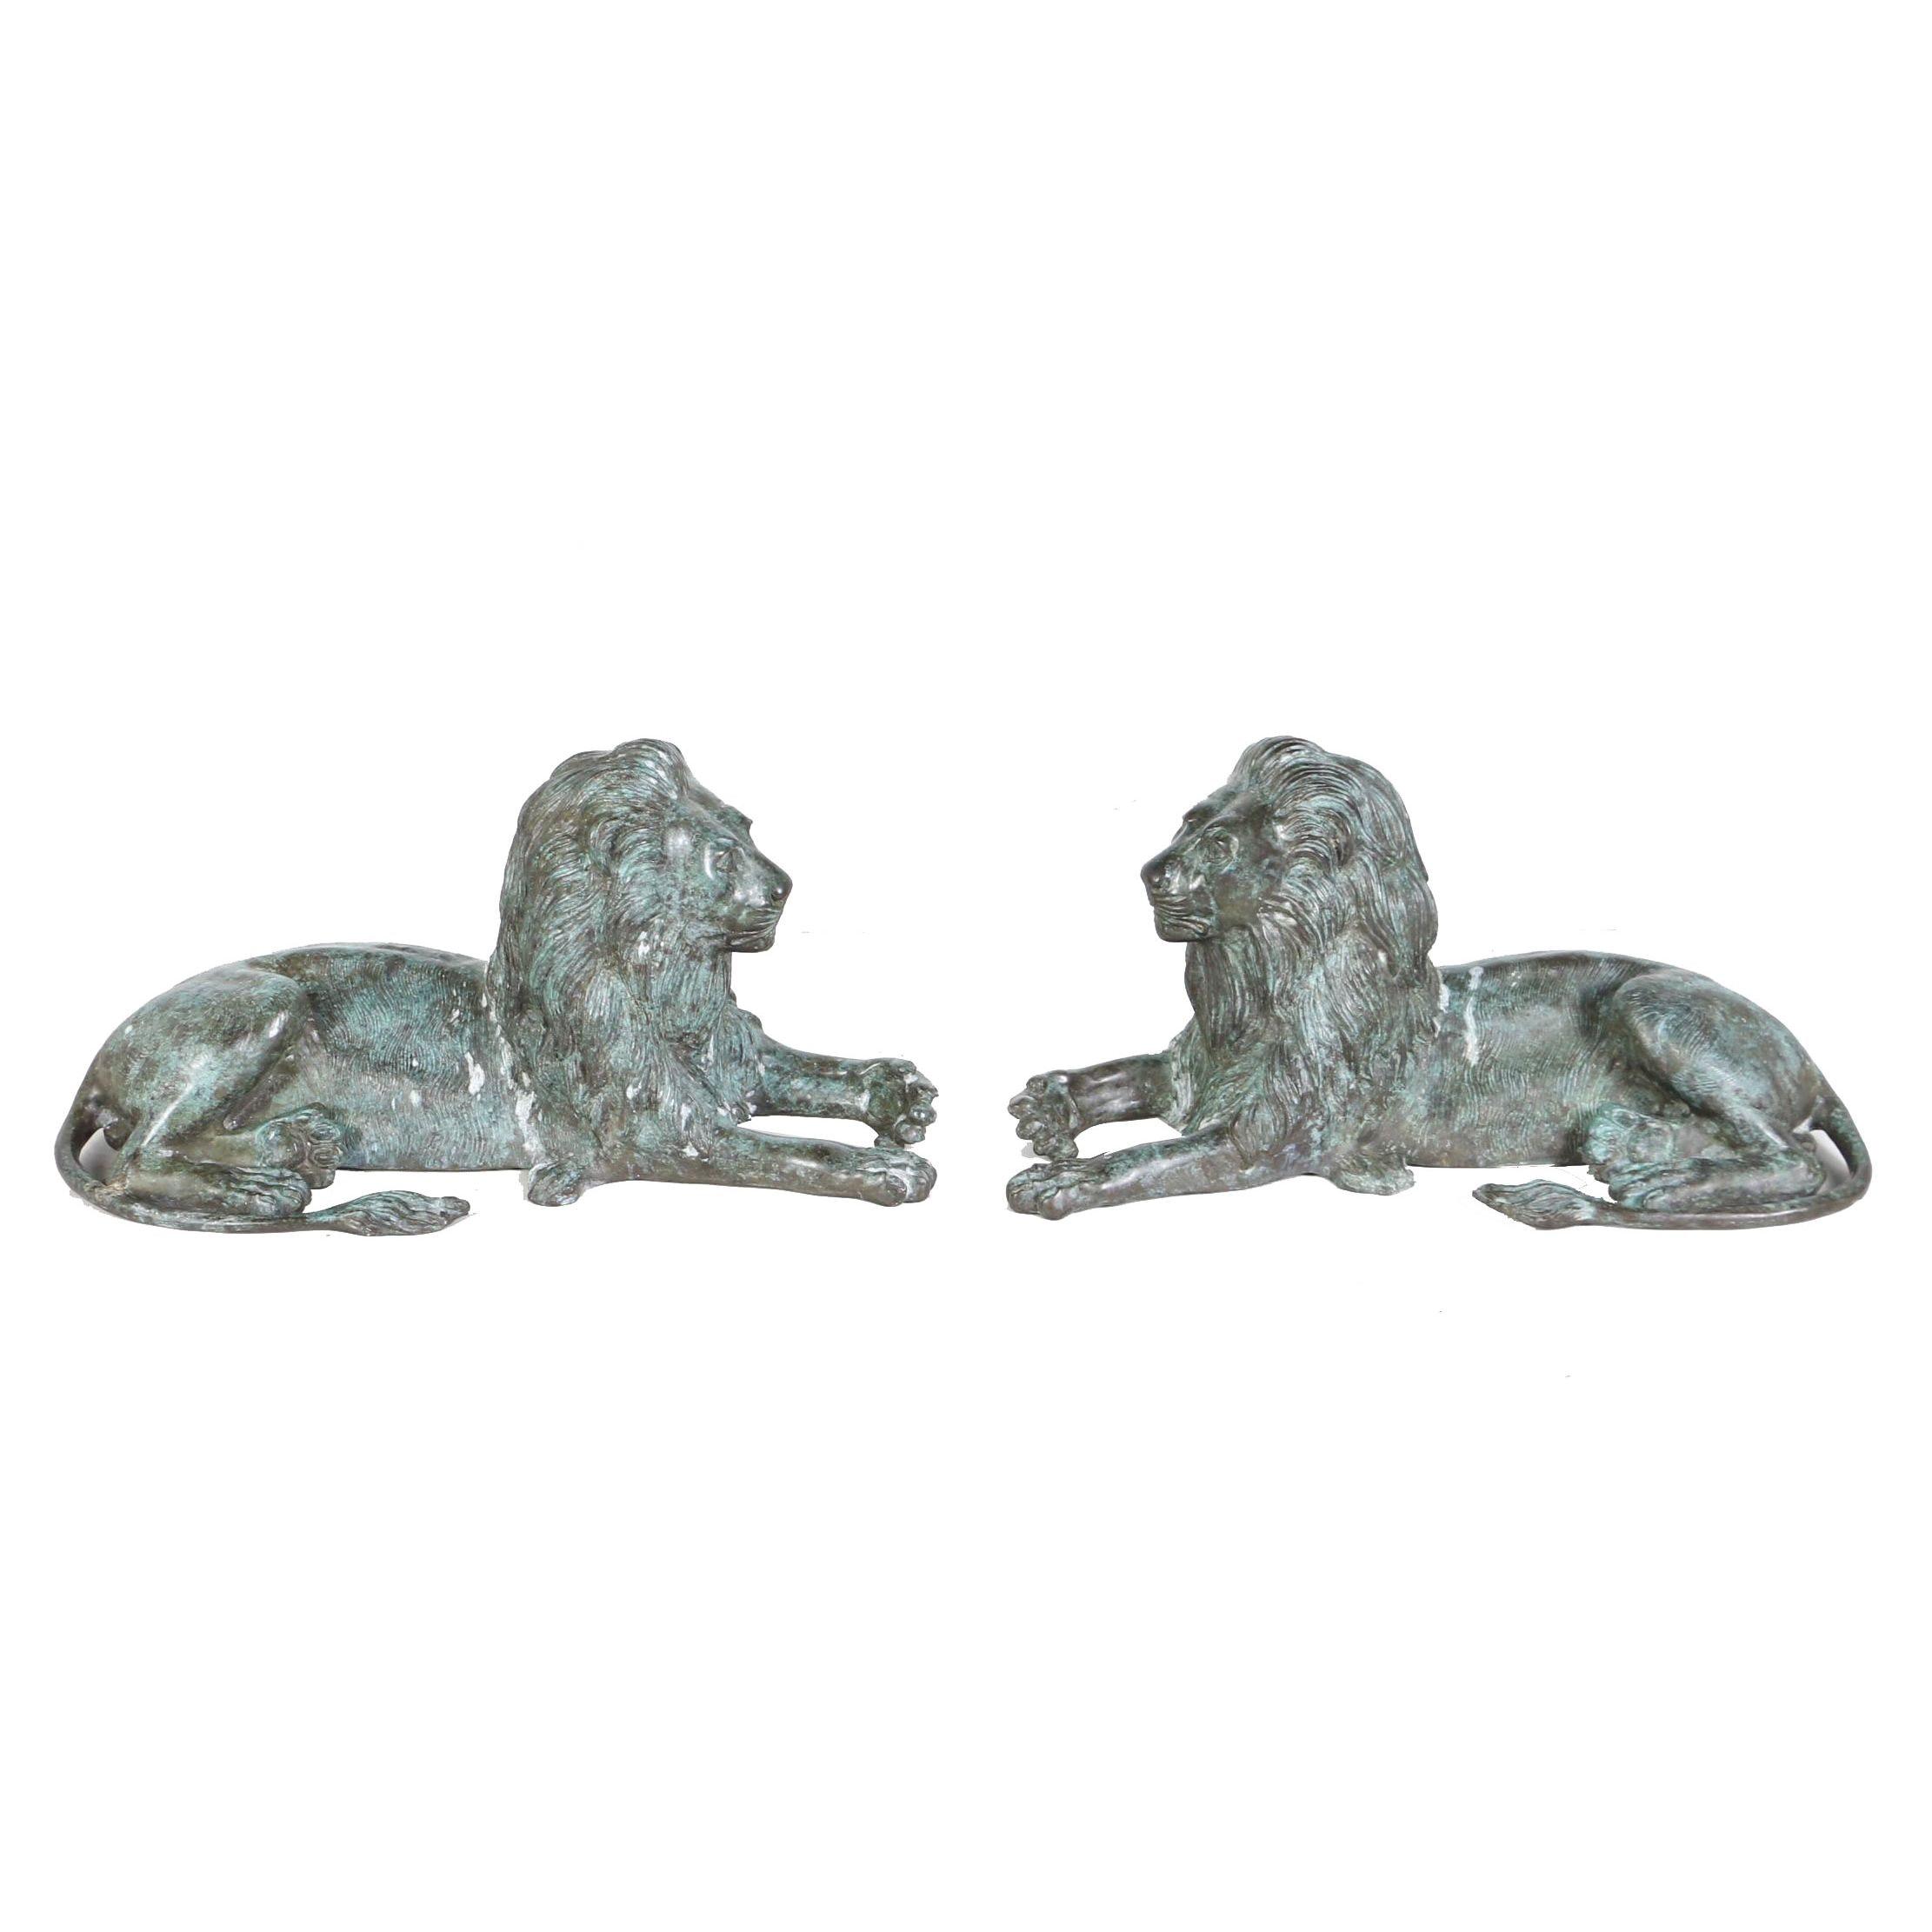 20th Century Patinated Brass Lion Sculptures